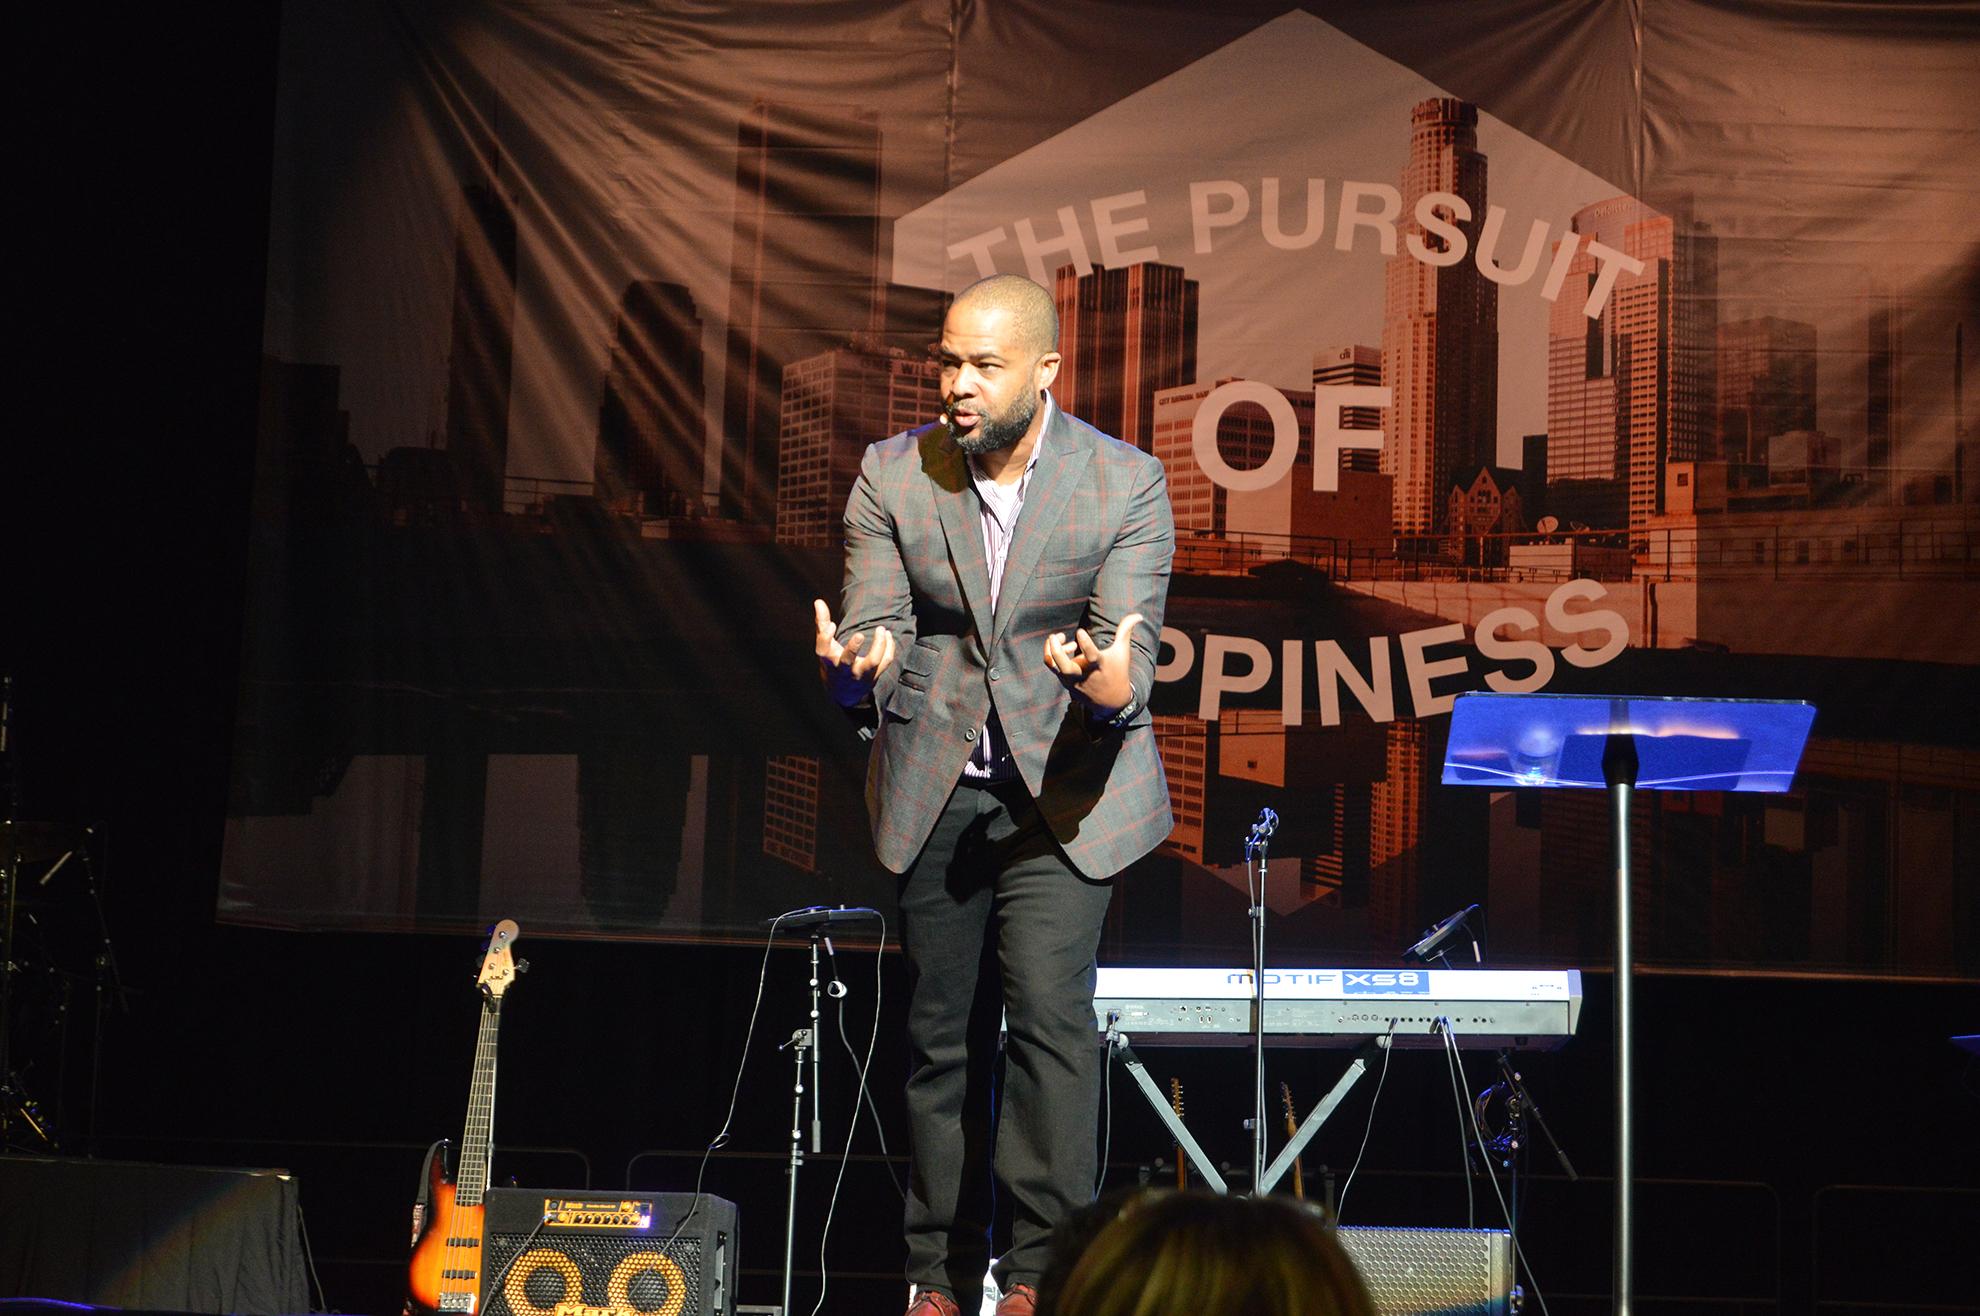 Christians need active love, chapel speaker says